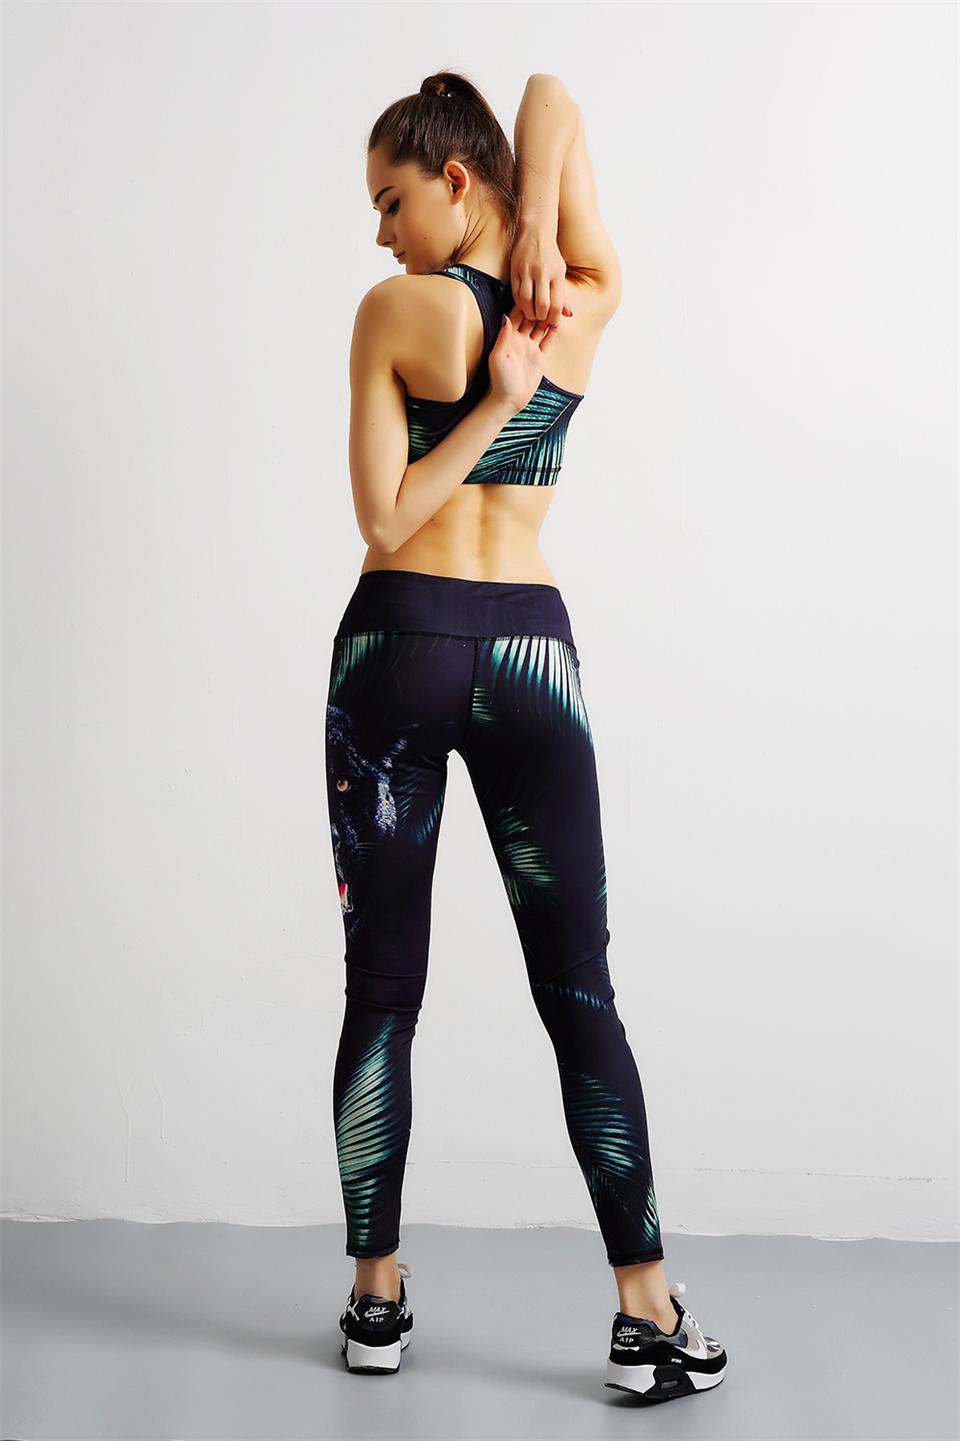 SSMENG Womens 2021 Trendy Mountain Landscape Painting Print Pocket Athletic Pants Sports Hip Hop Yoga Dance Trousers